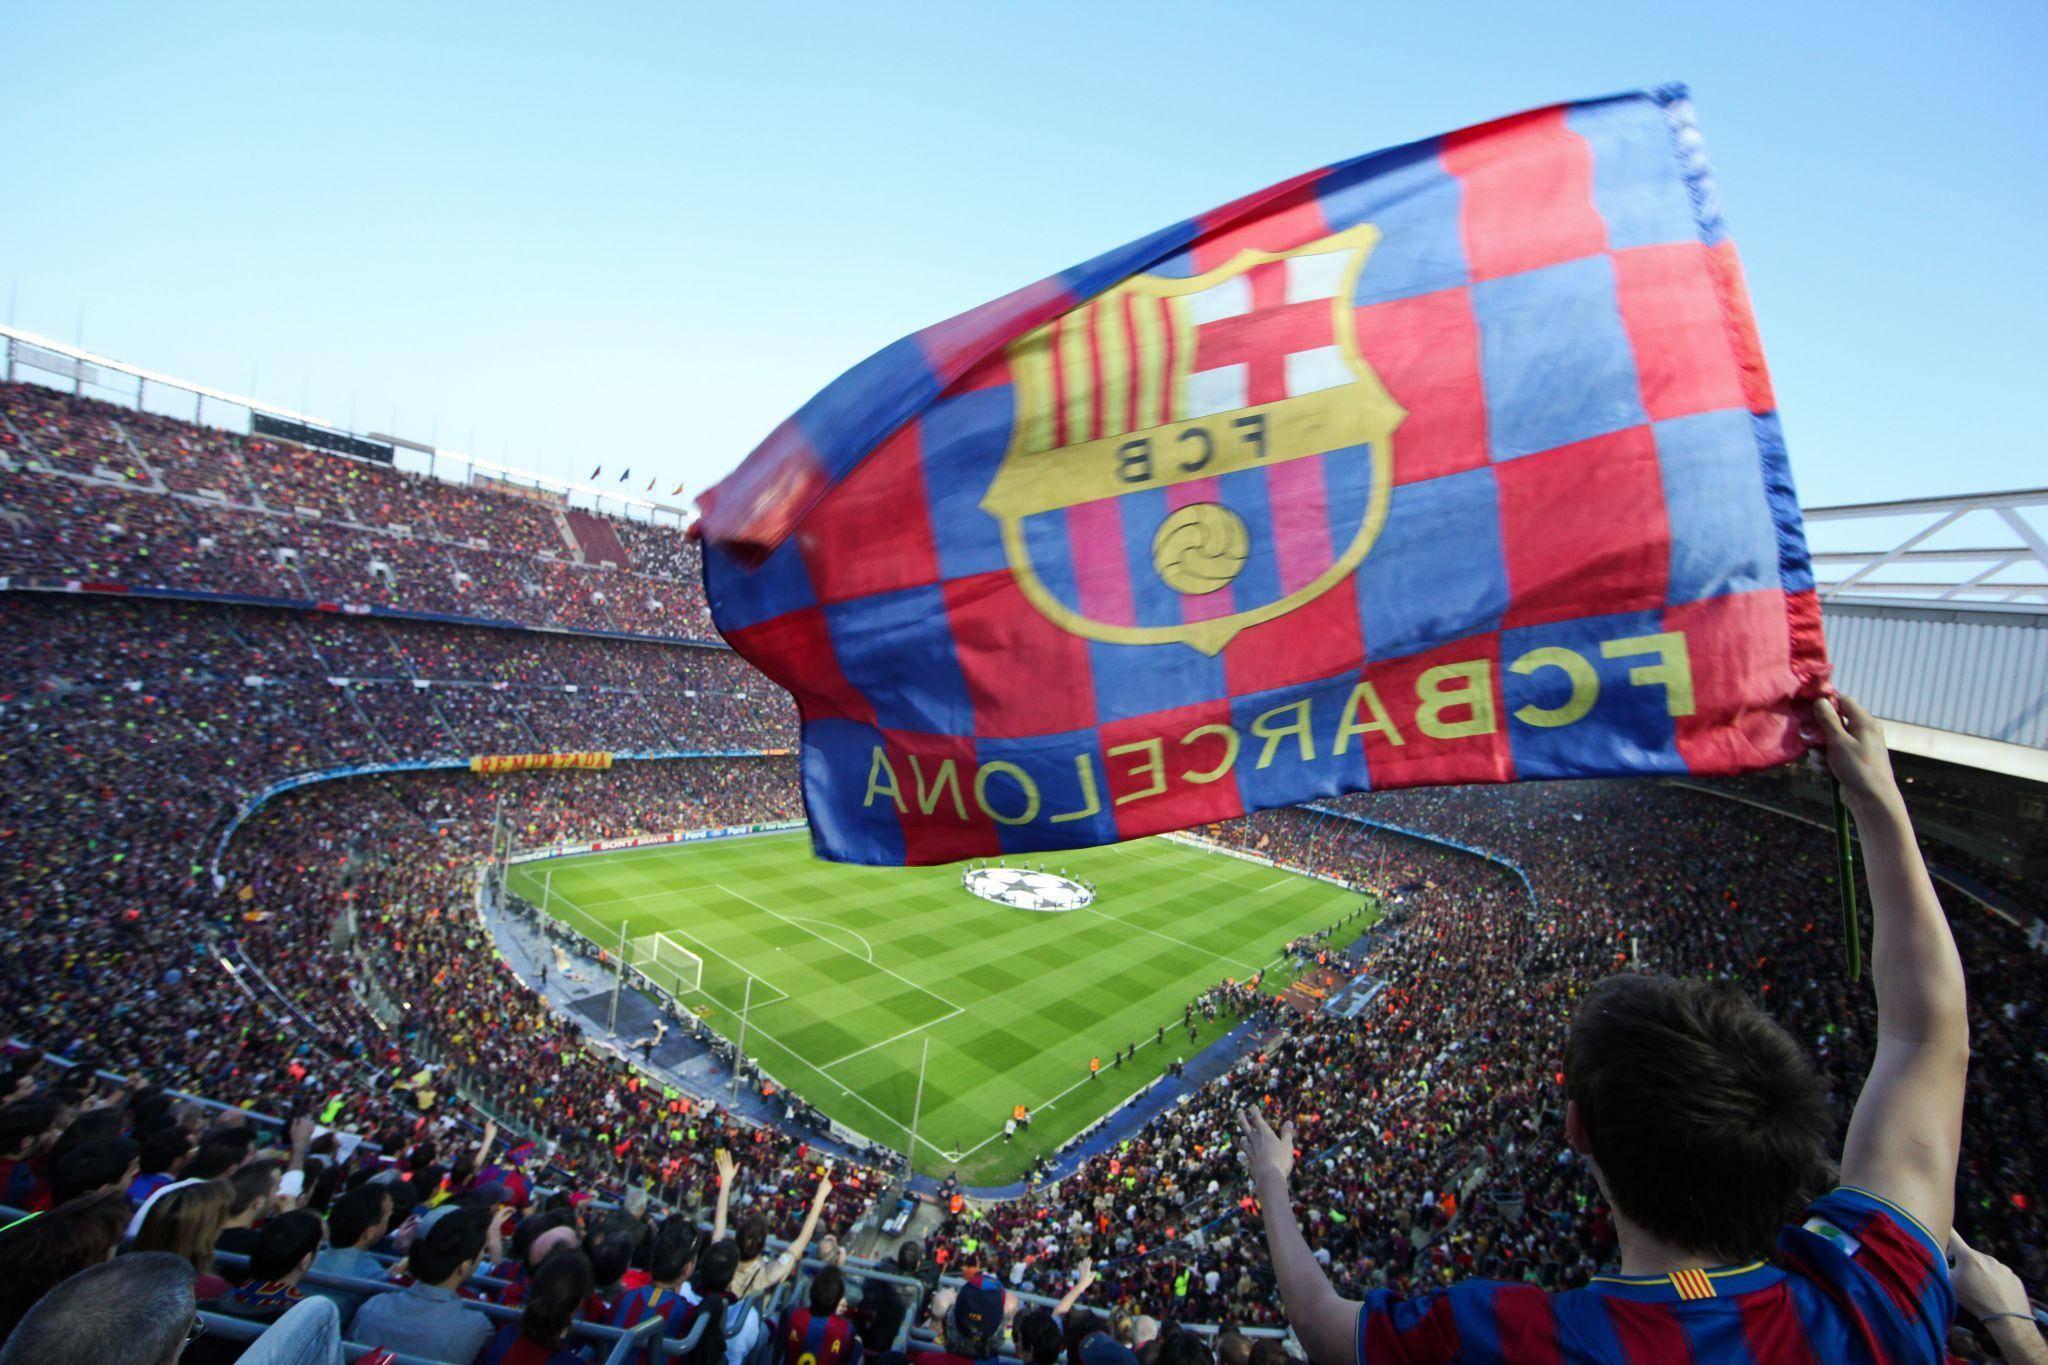 Barcelona 2 Camp Nou